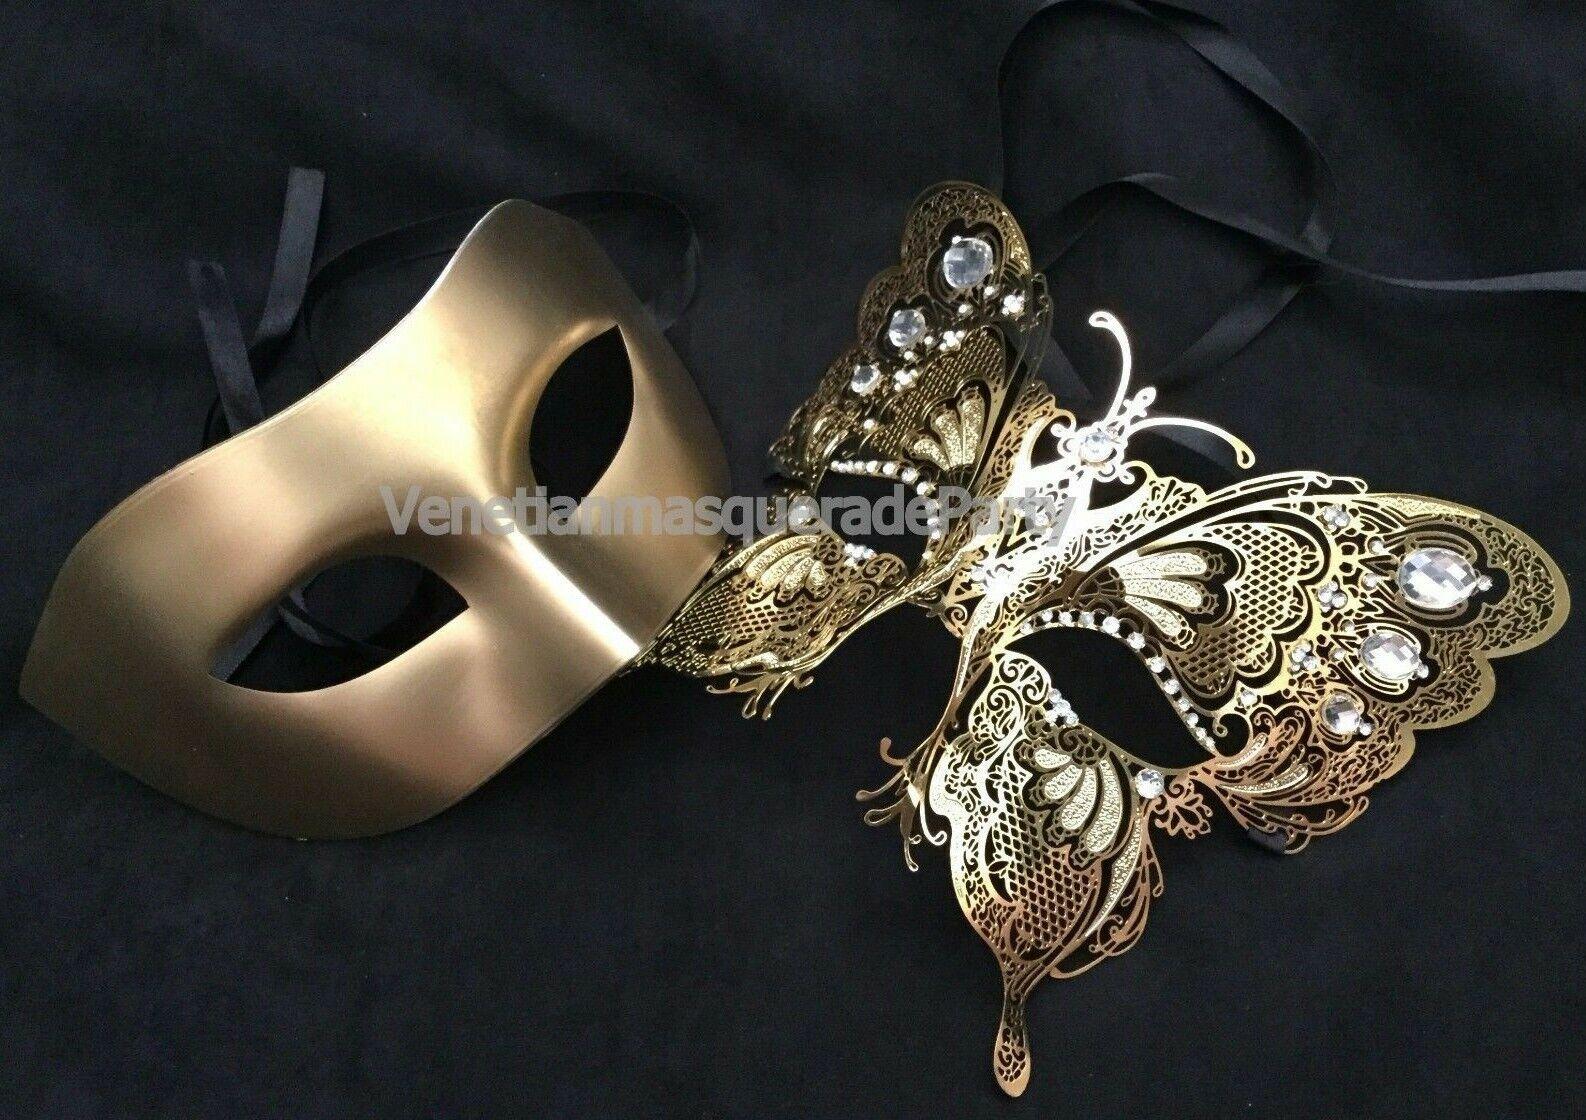 Gold Luxury Couple eye mask Masquerade ball School Prom Dress up Wedding party